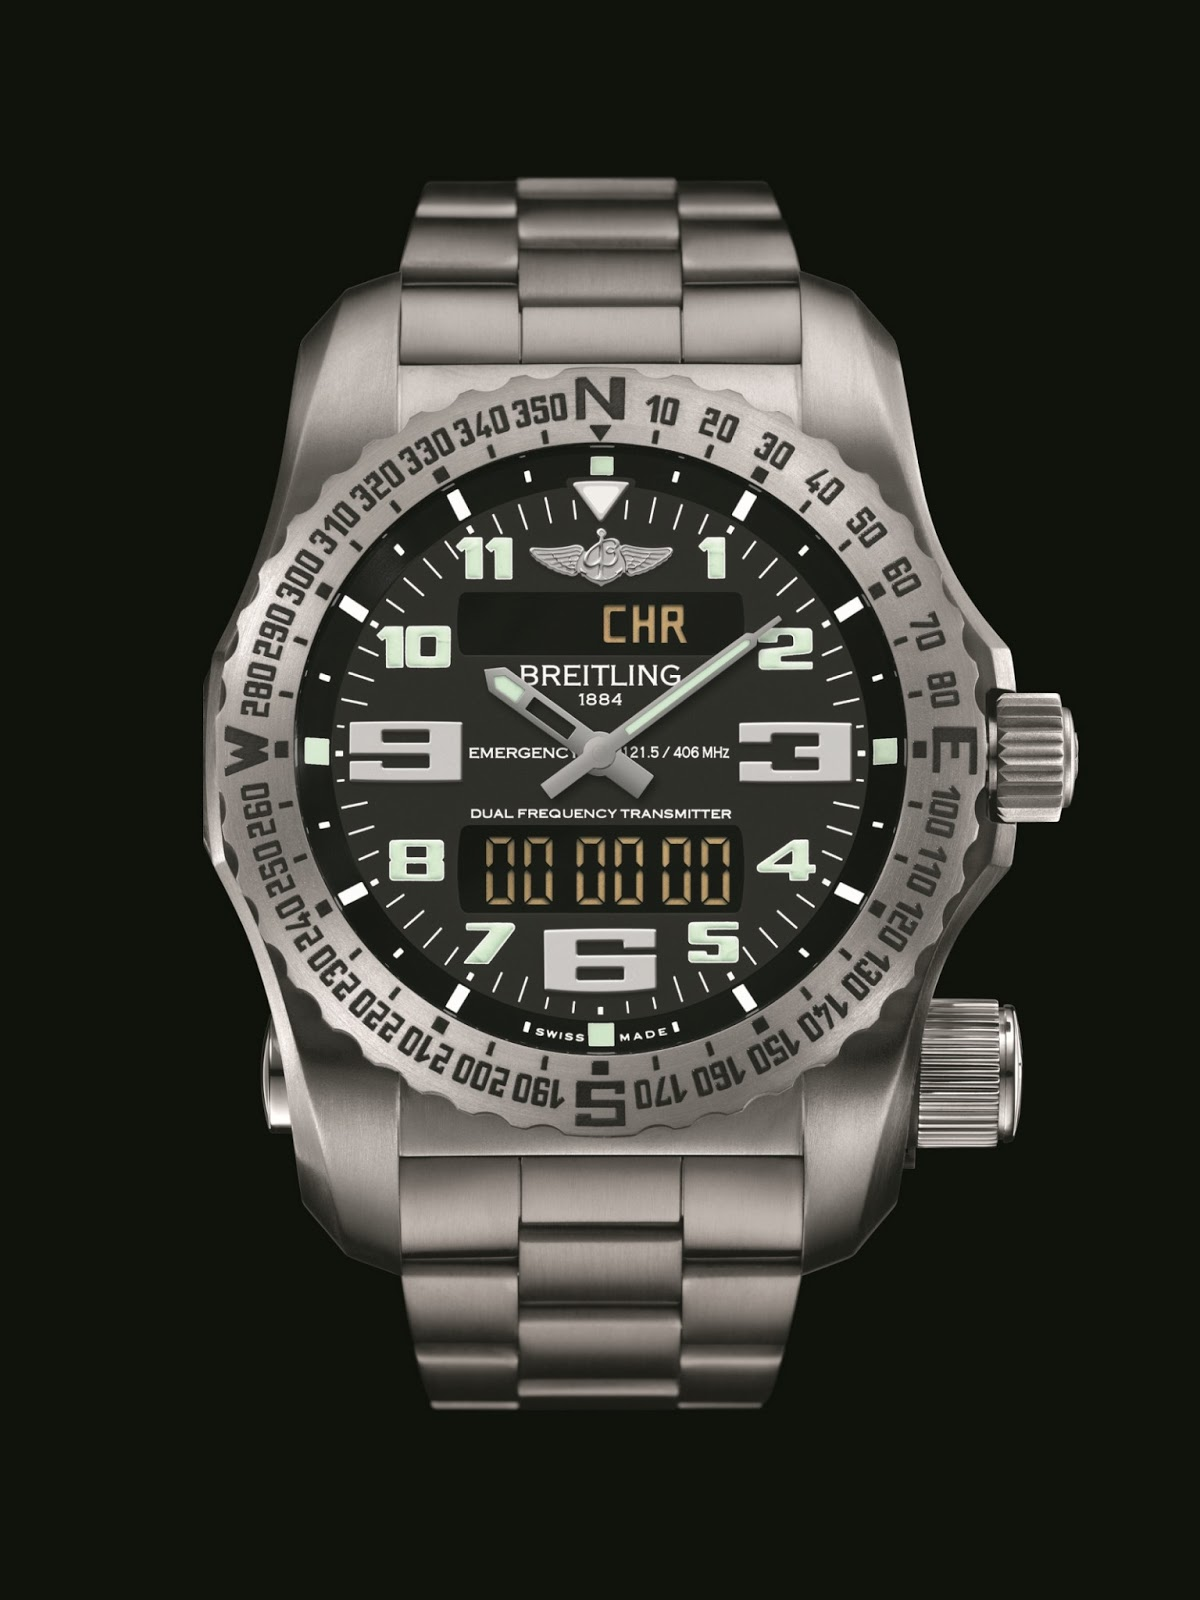 New Emergency II & Breitling for Bentley Timepieces FADED4U